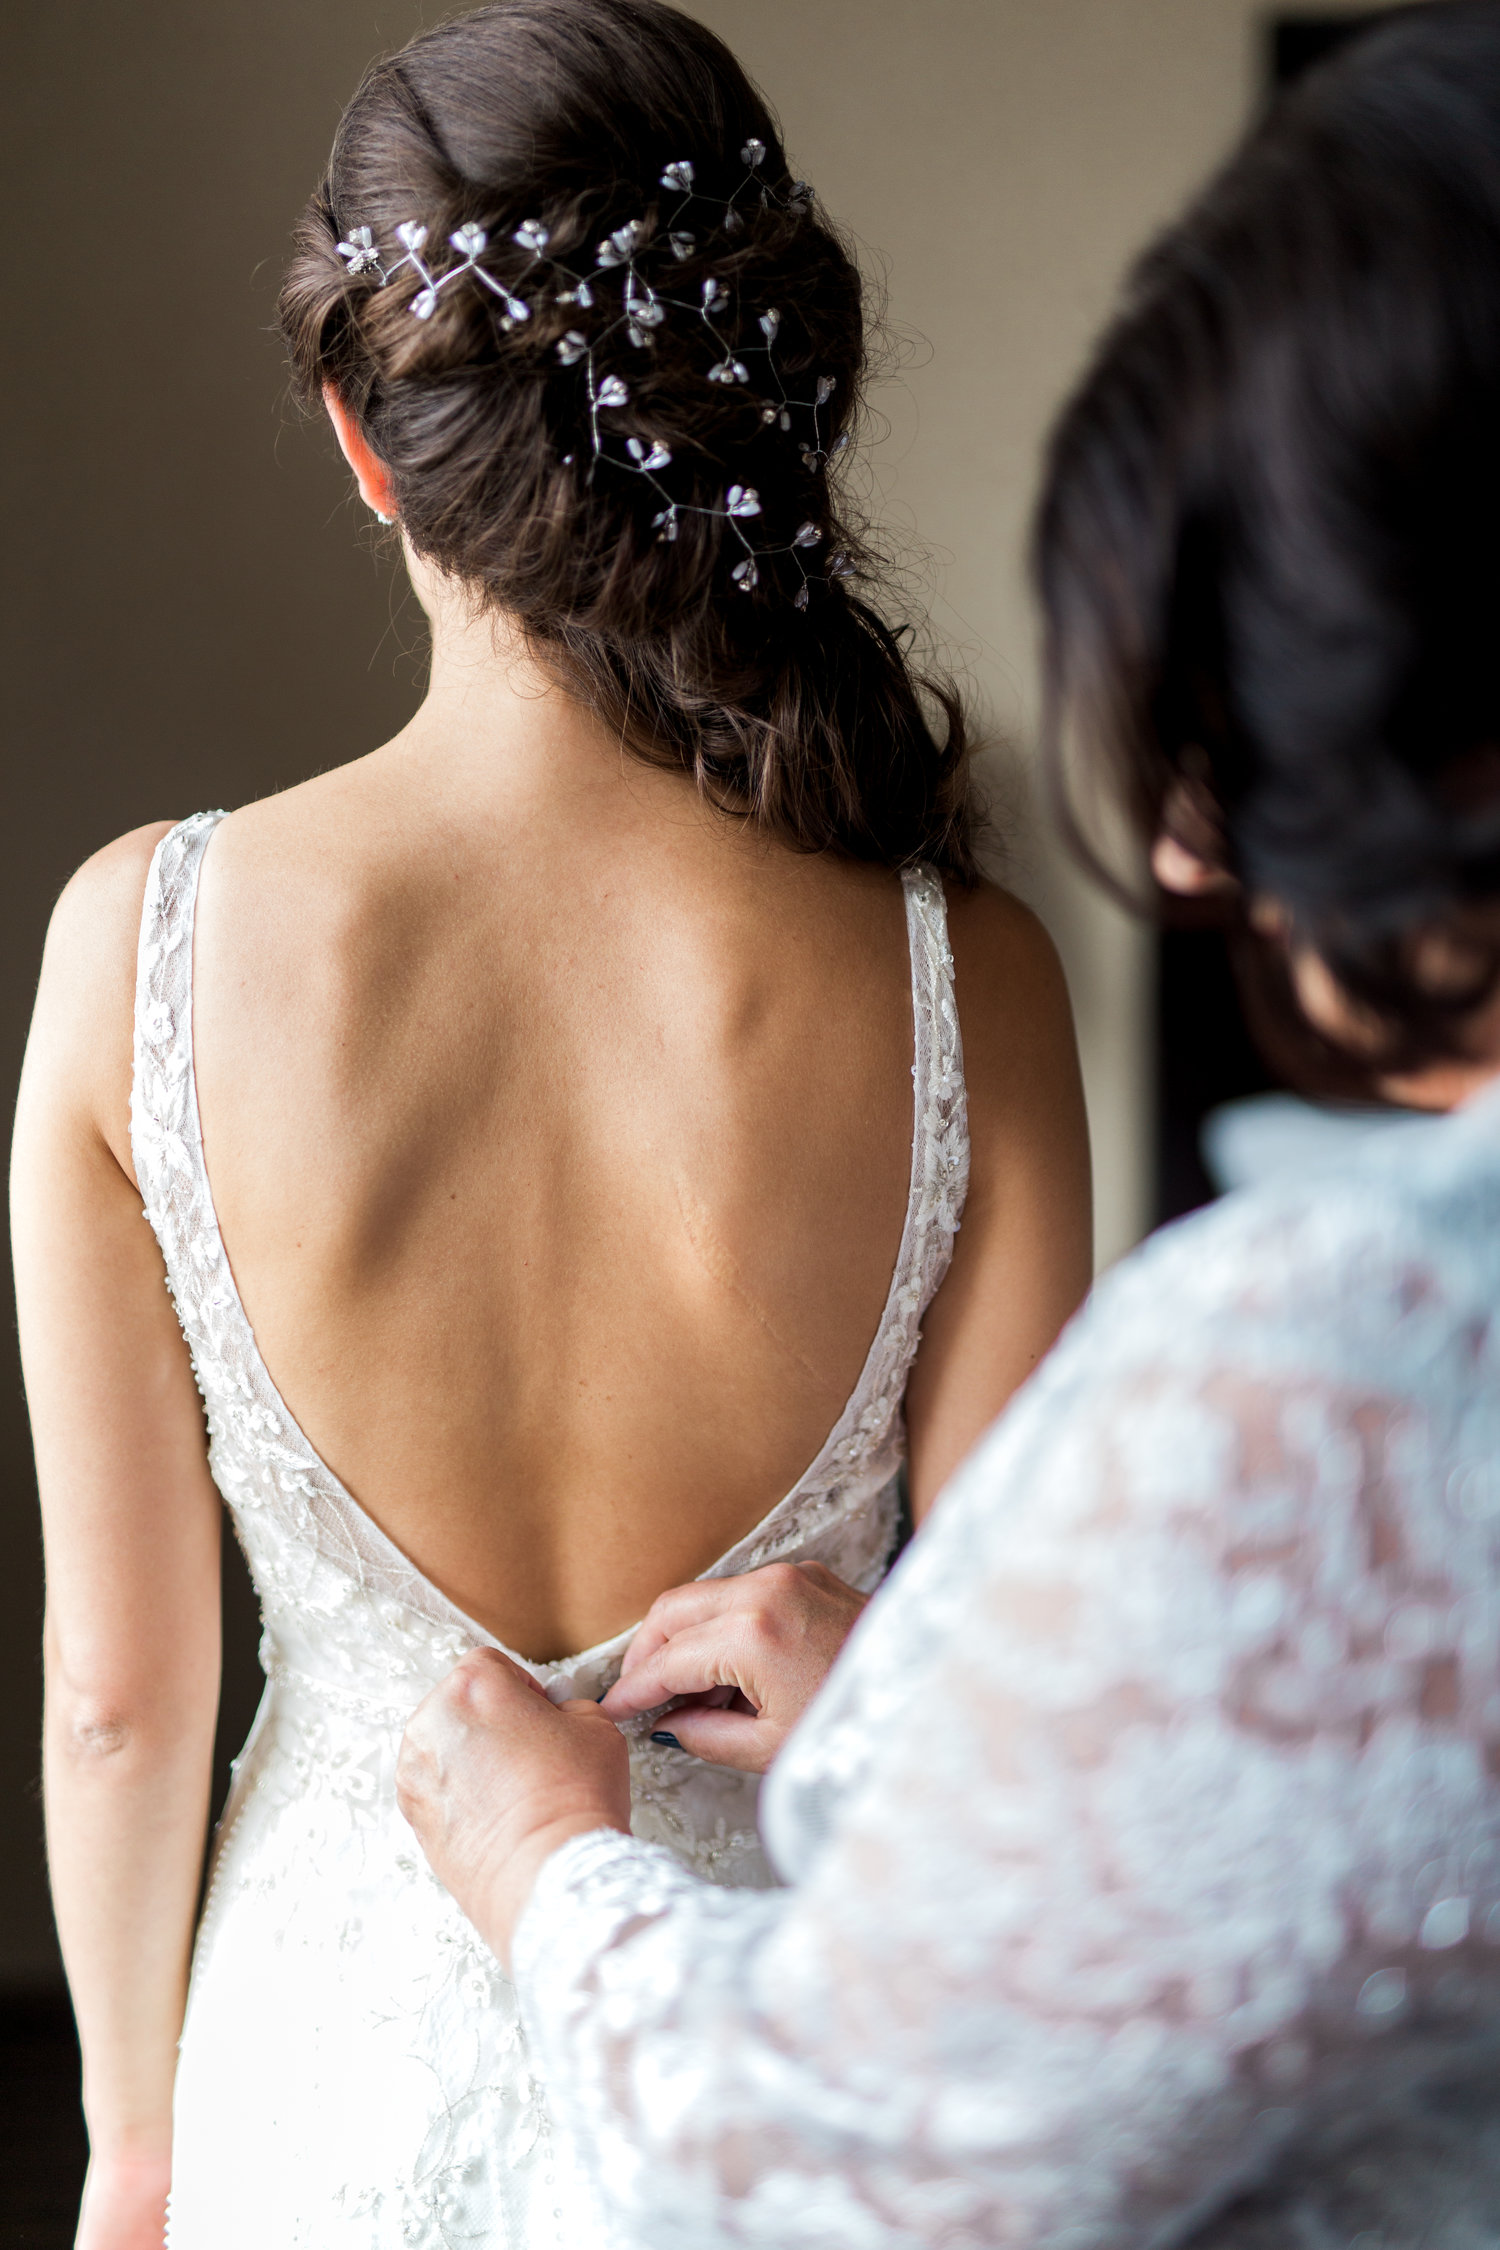 Amir-Golbazi-Danielle-Giroux-Photography_Toronto-Wedding_Cedarwood_Rachel-Paul_086.jpg